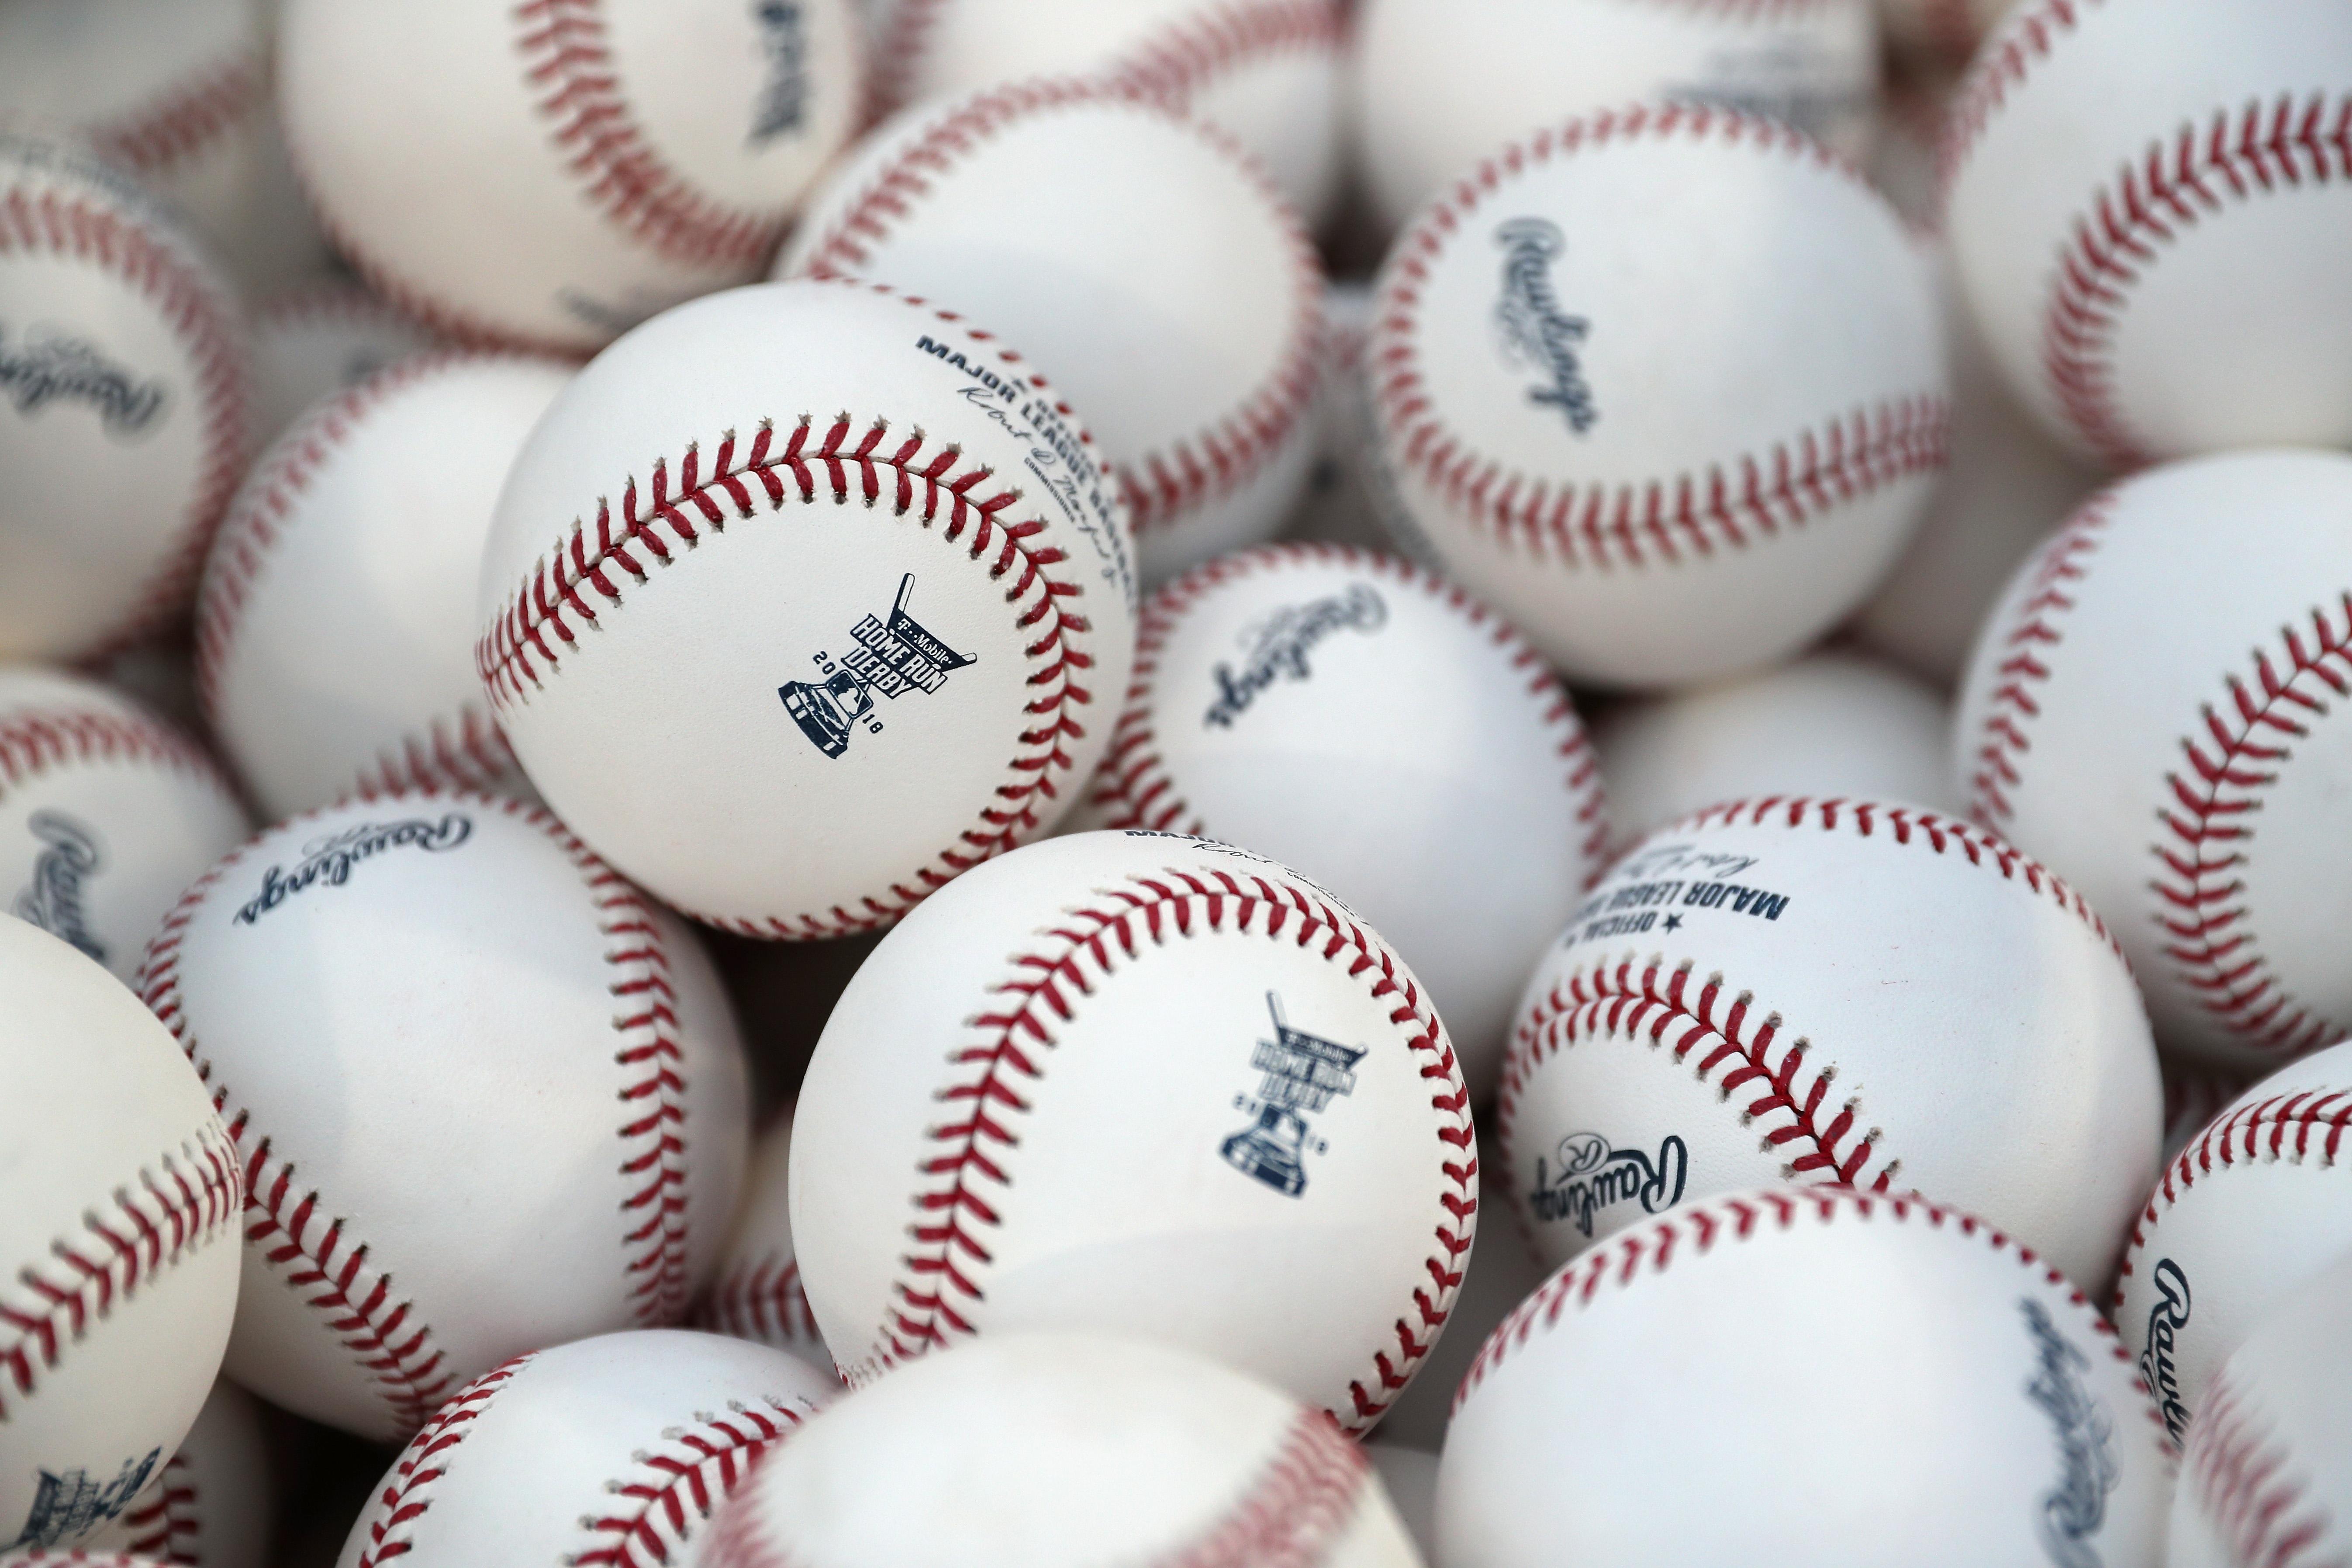 T-Mobile Home Run Derby